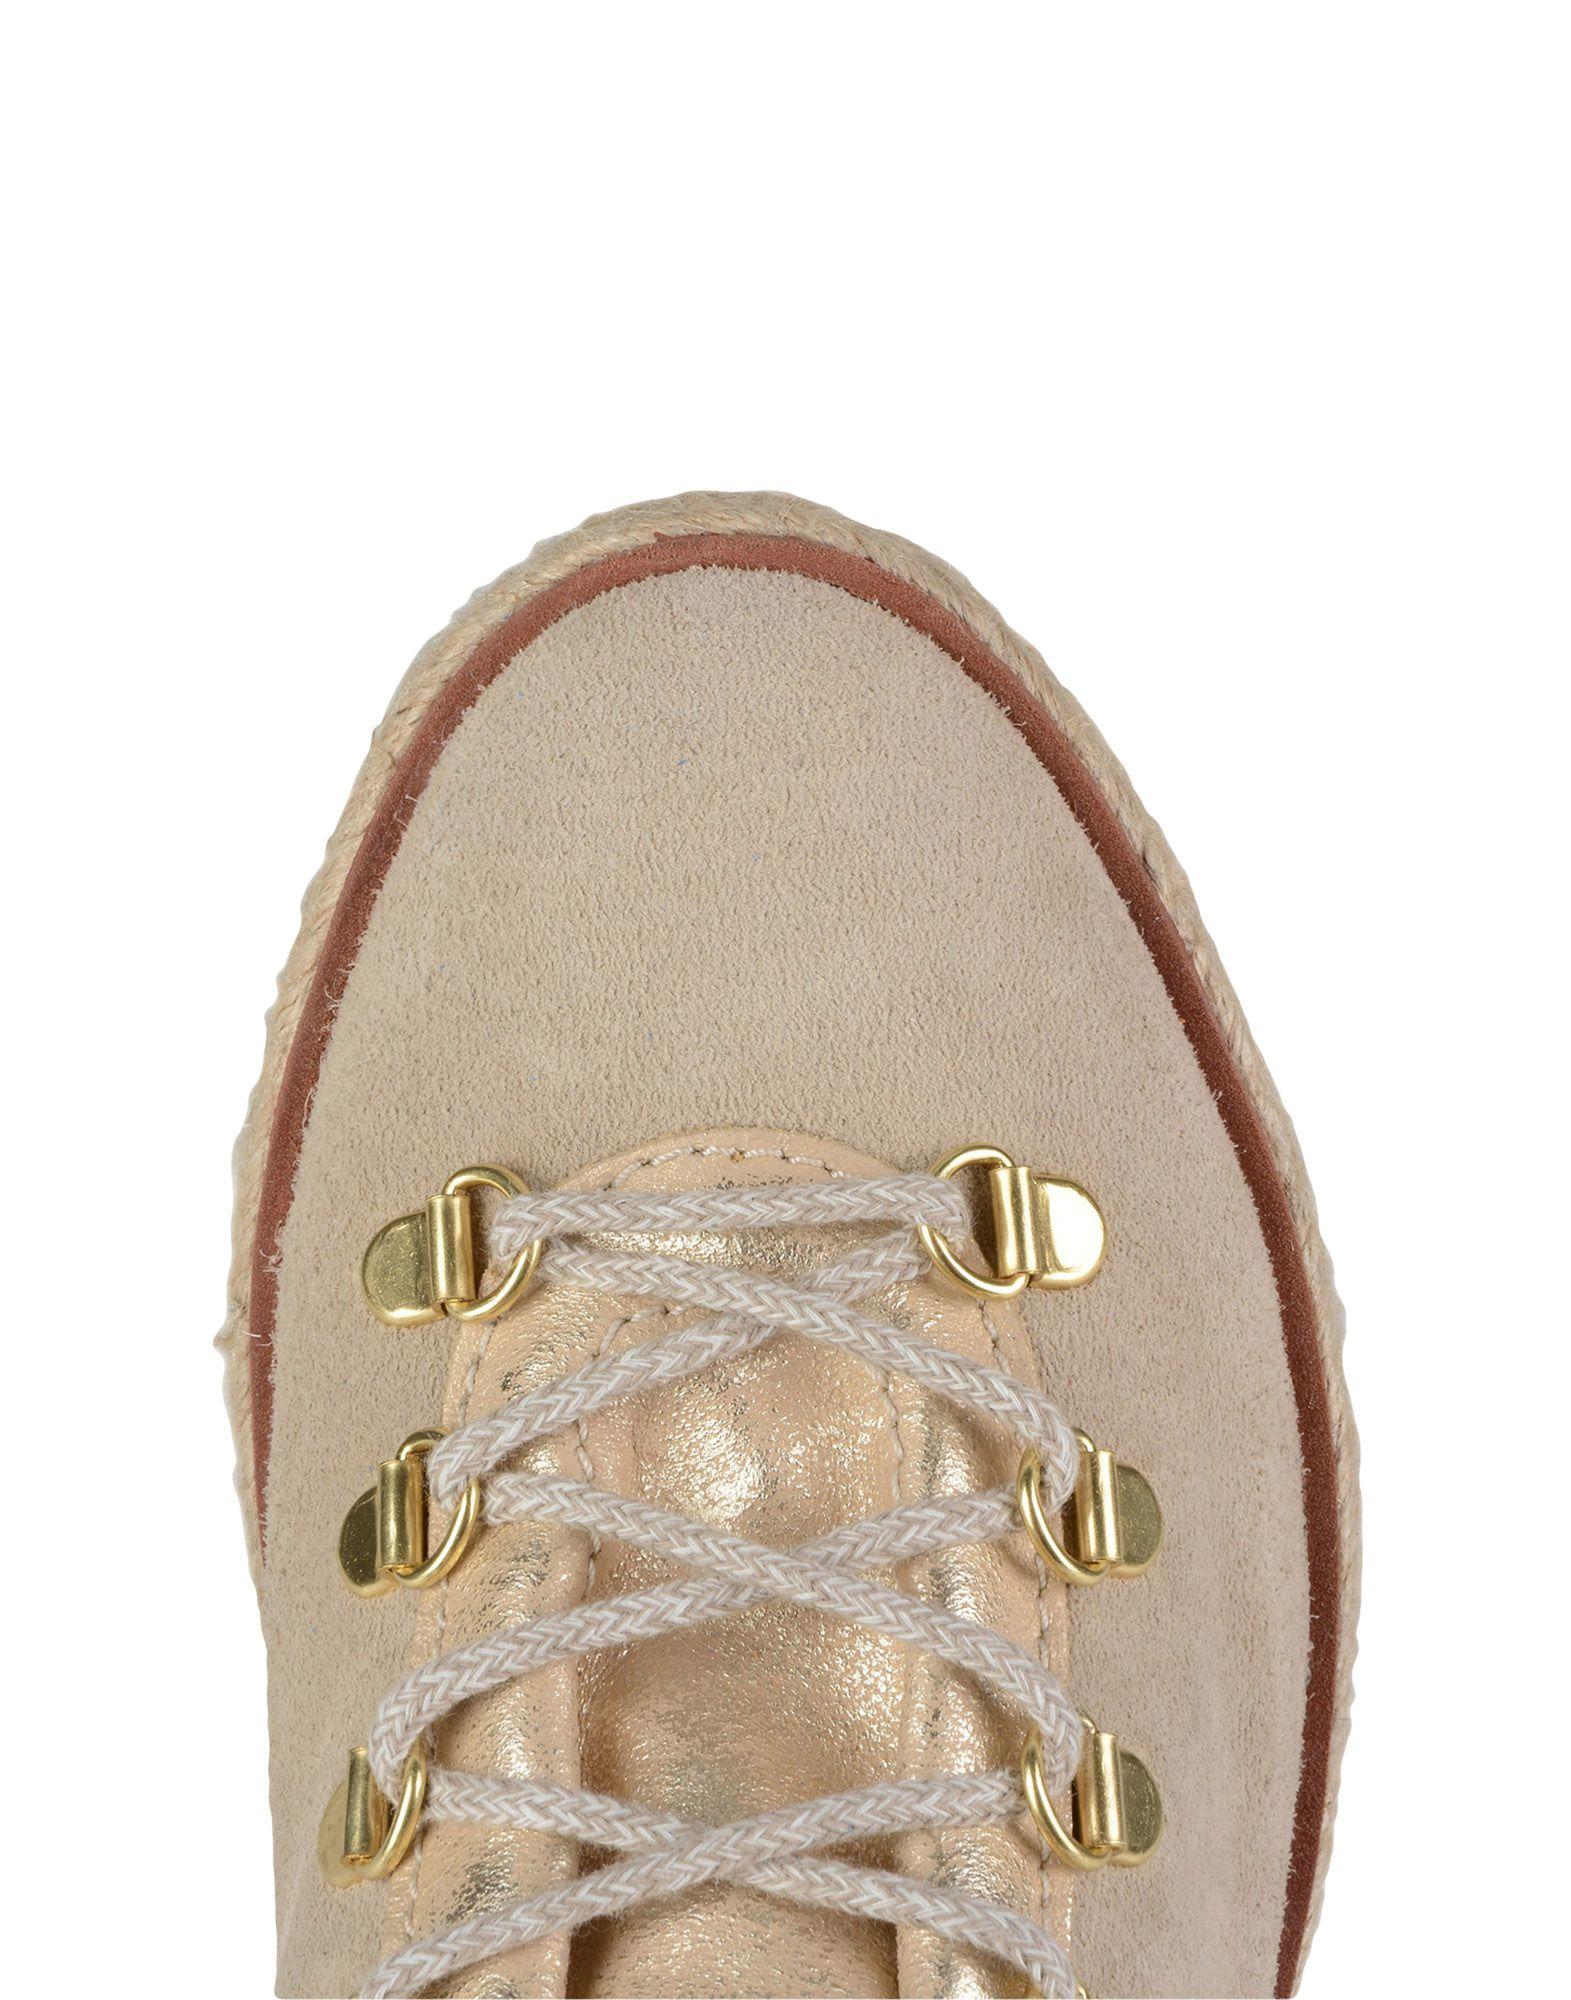 Napapijri Damen Stiefelette Damen Napapijri  11394855GG Gute Qualität beliebte Schuhe eff736